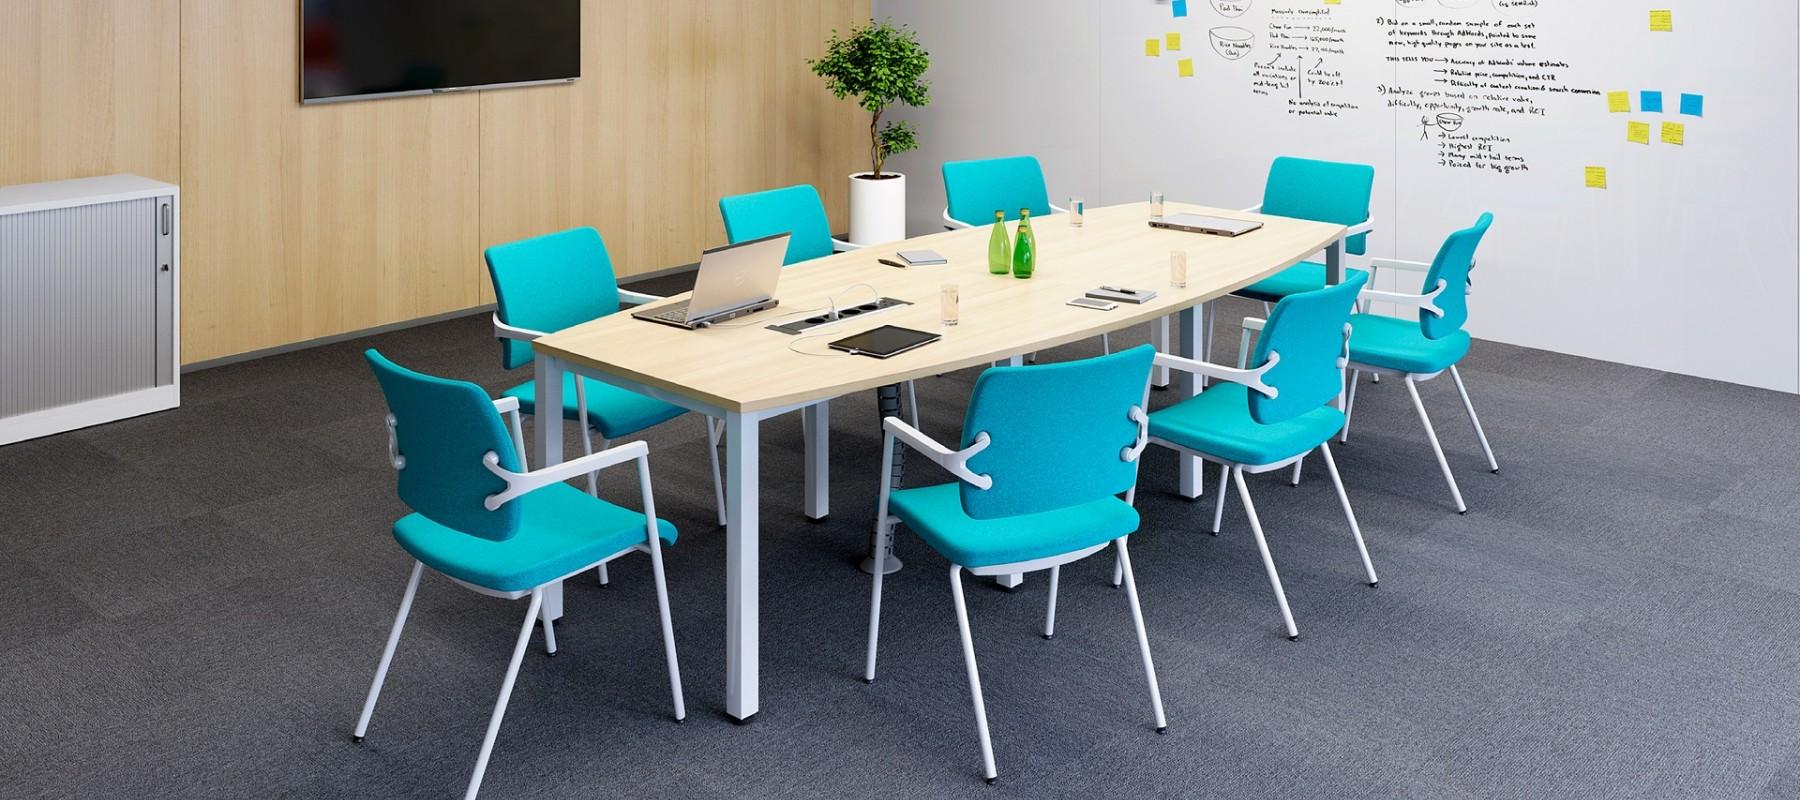 fotele-krzesla-siedziska-4me-2me-aranzacje07